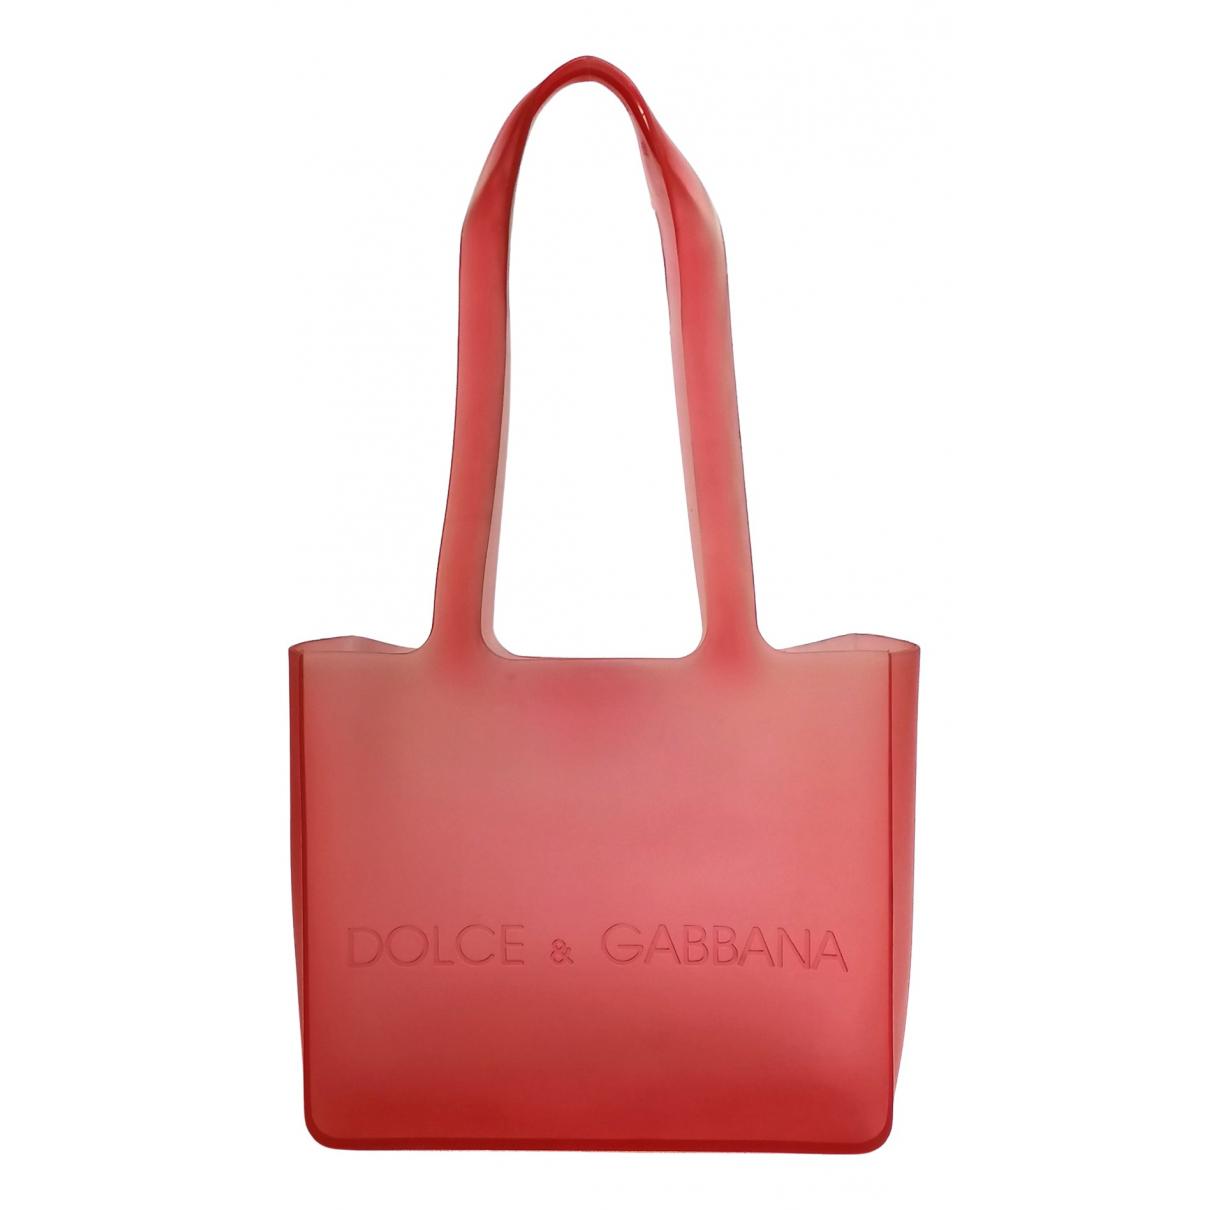 Dolce & Gabbana - Sac a main   pour femme - rouge